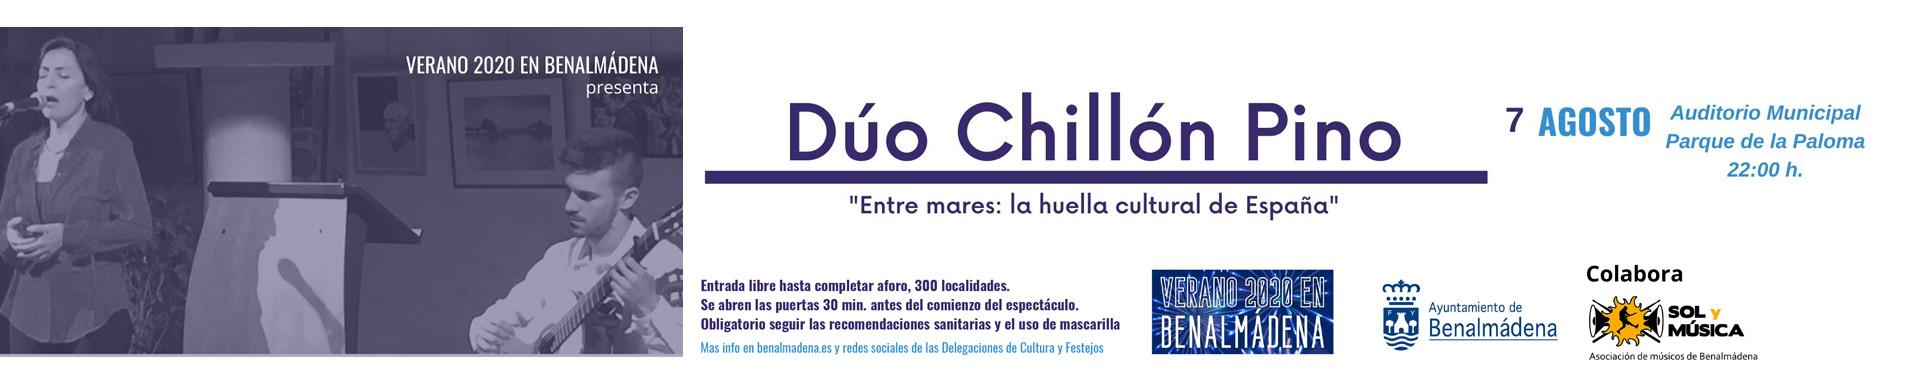 Dúo Chillón Pino